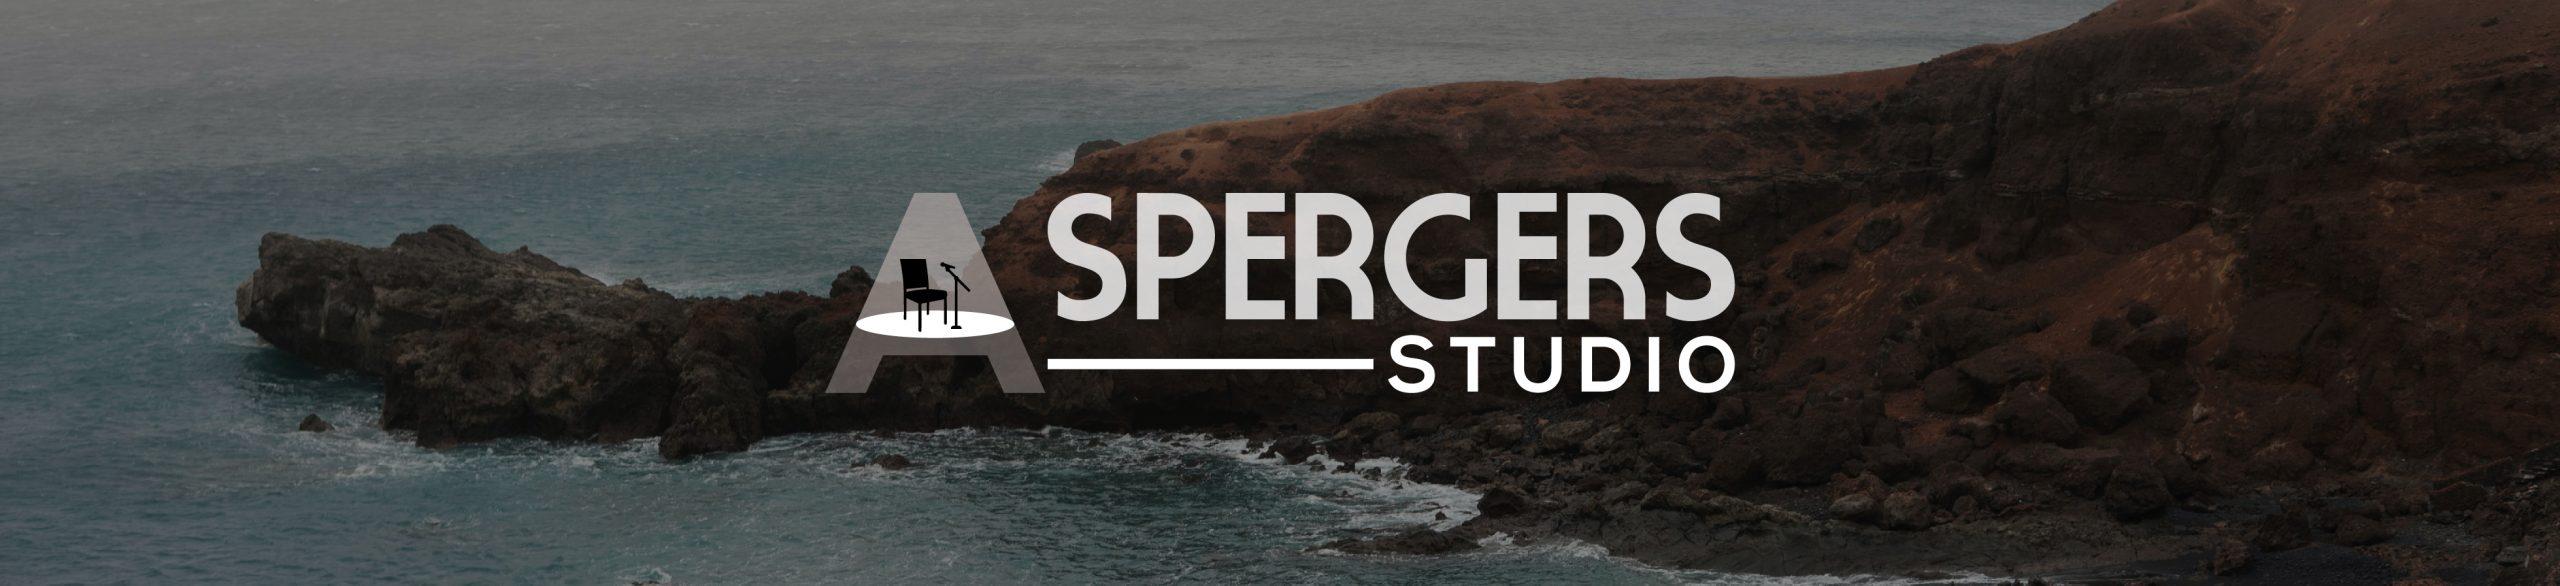 Aspergers Studio